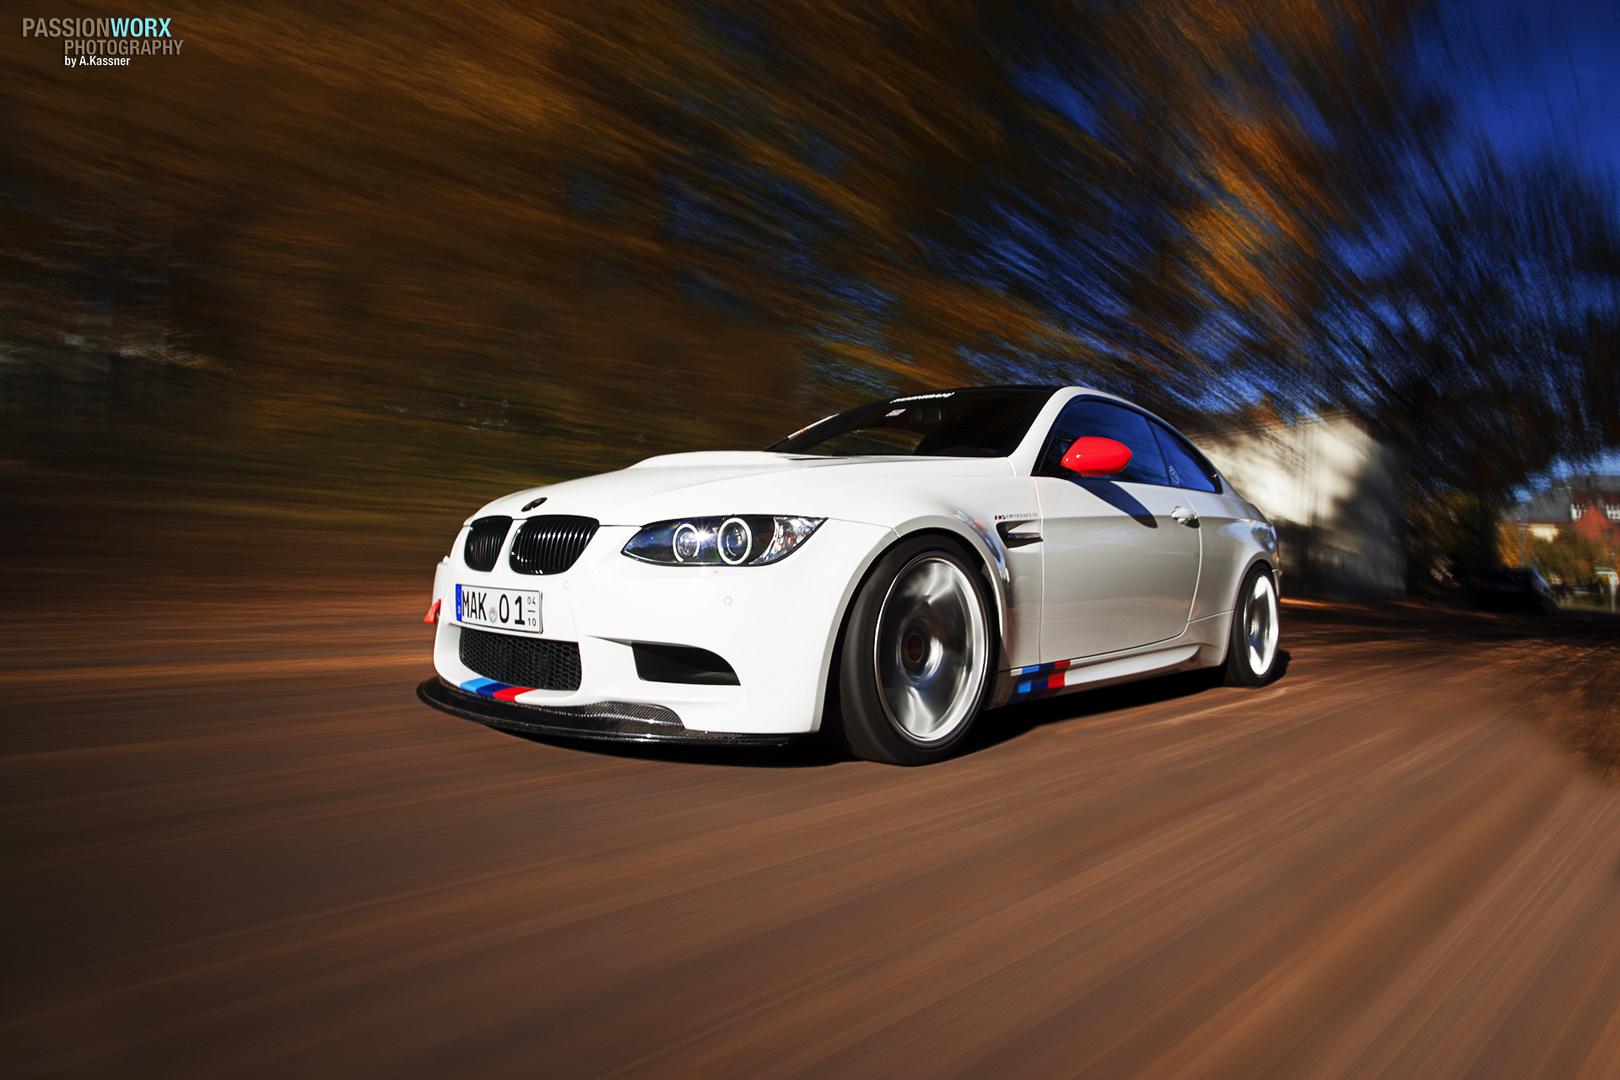 BMW E92 M3 Rigshot